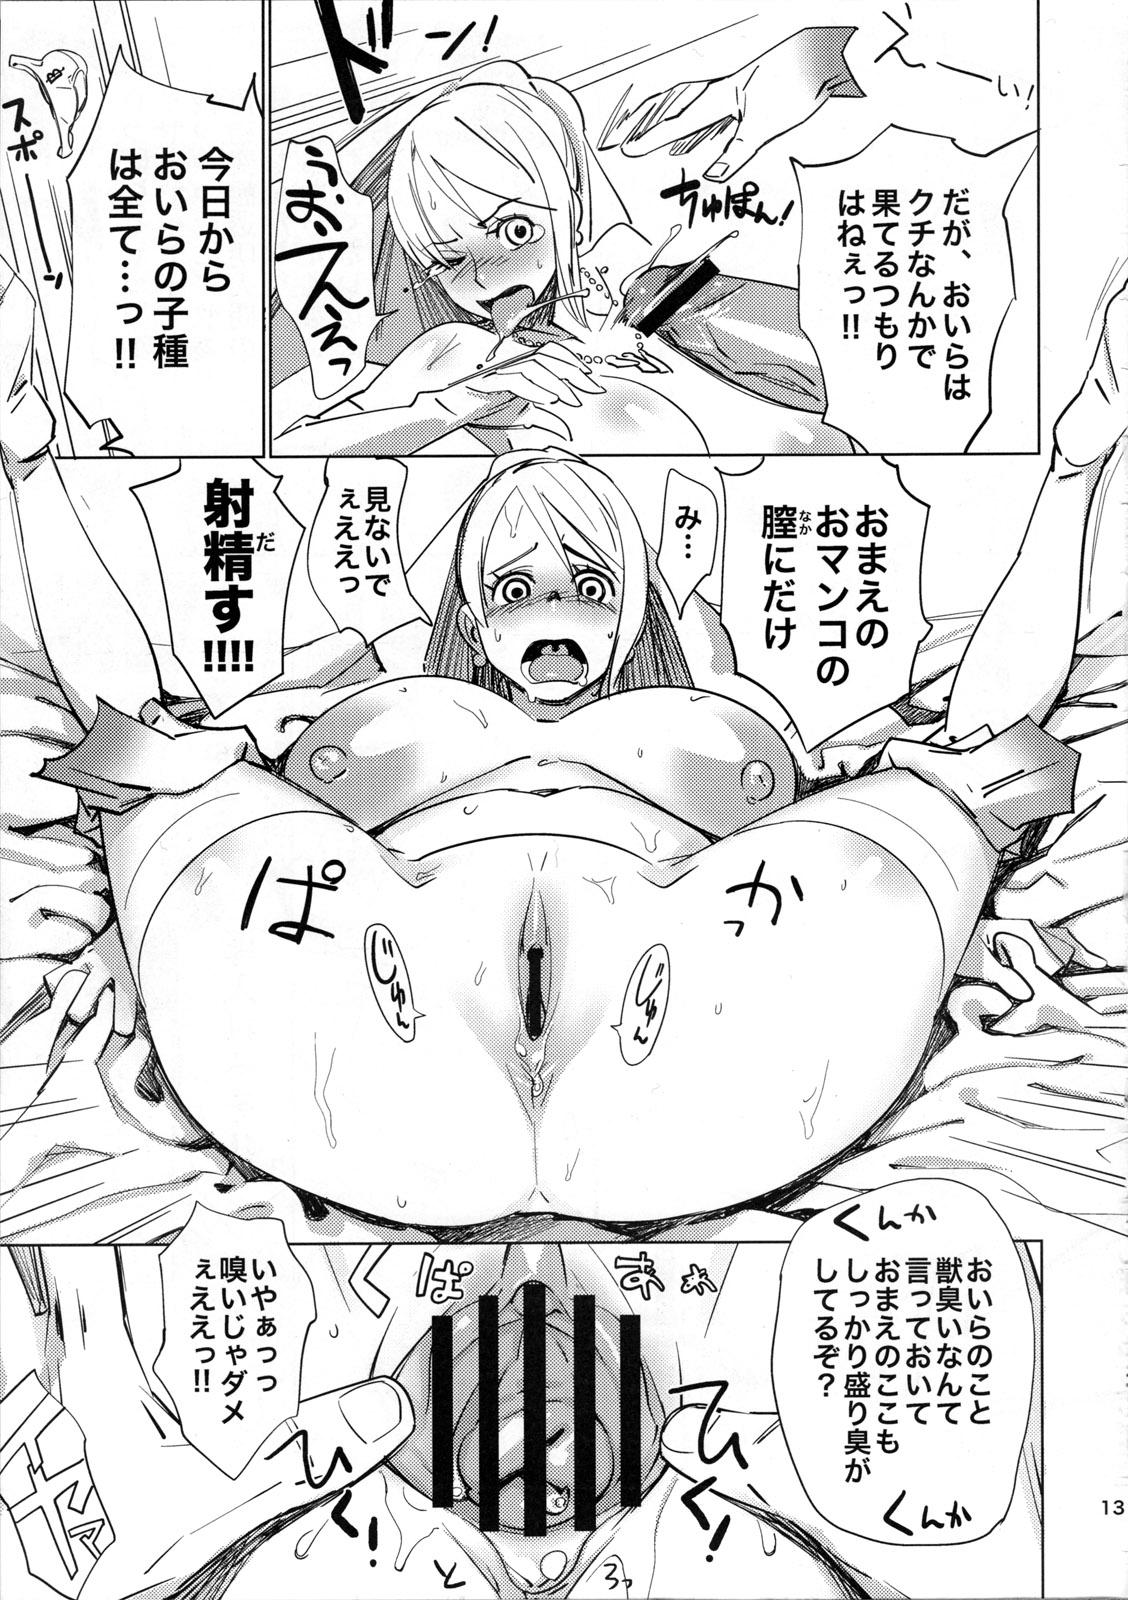 Shinsekai 12